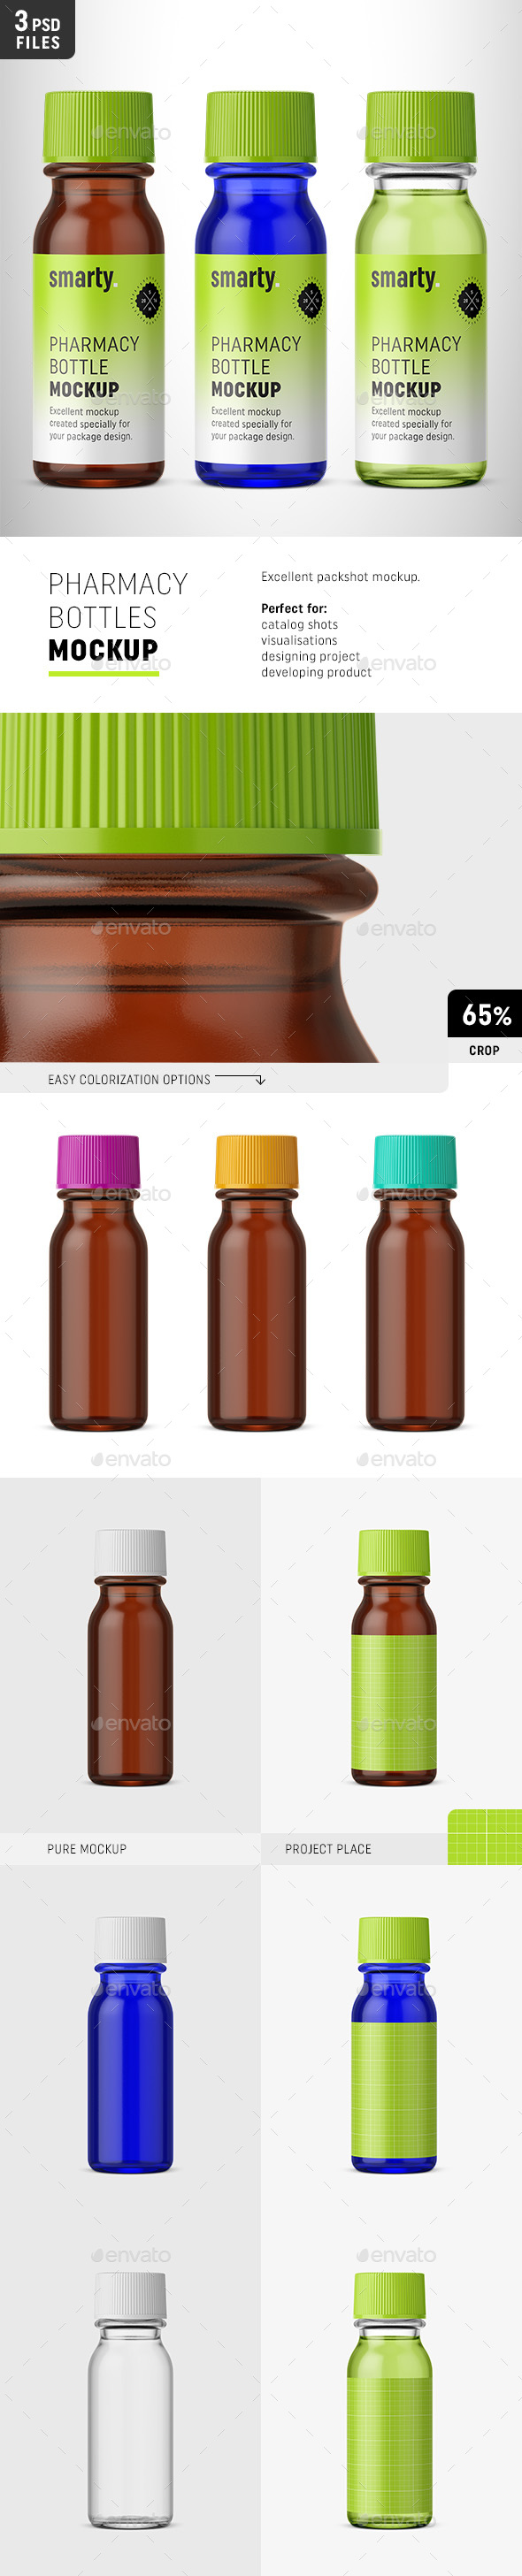 Pharmacy Bottles Mockup - Packaging Product Mock-Ups